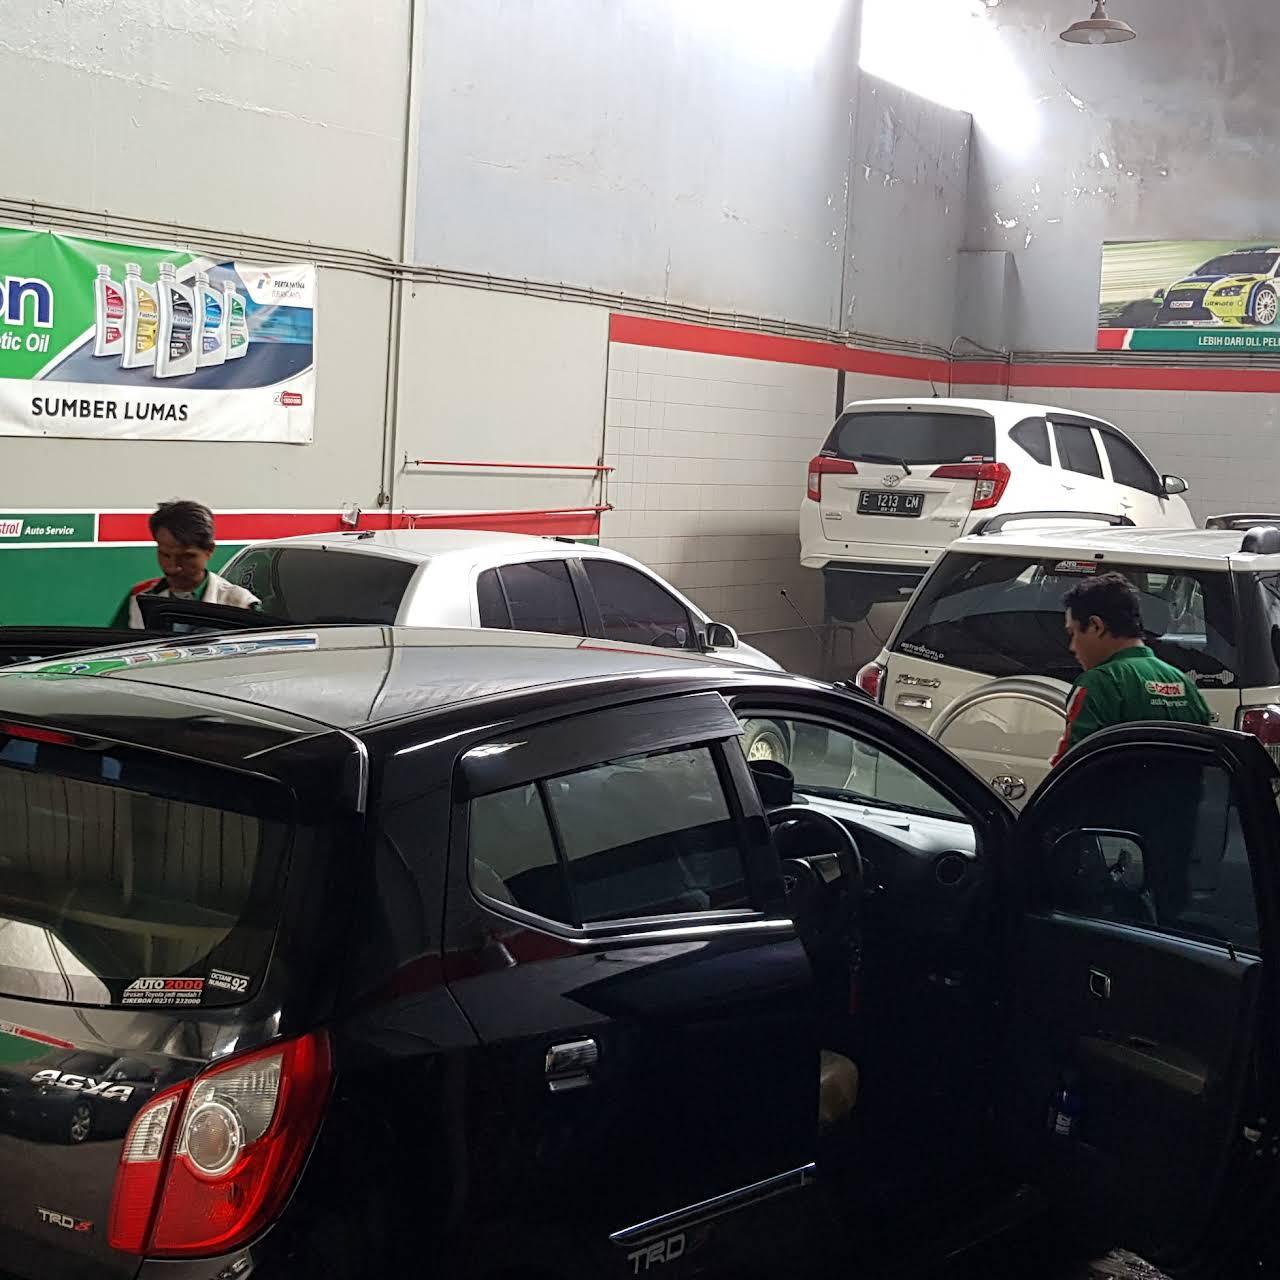 Sumber Lumas Auto Repair Shop